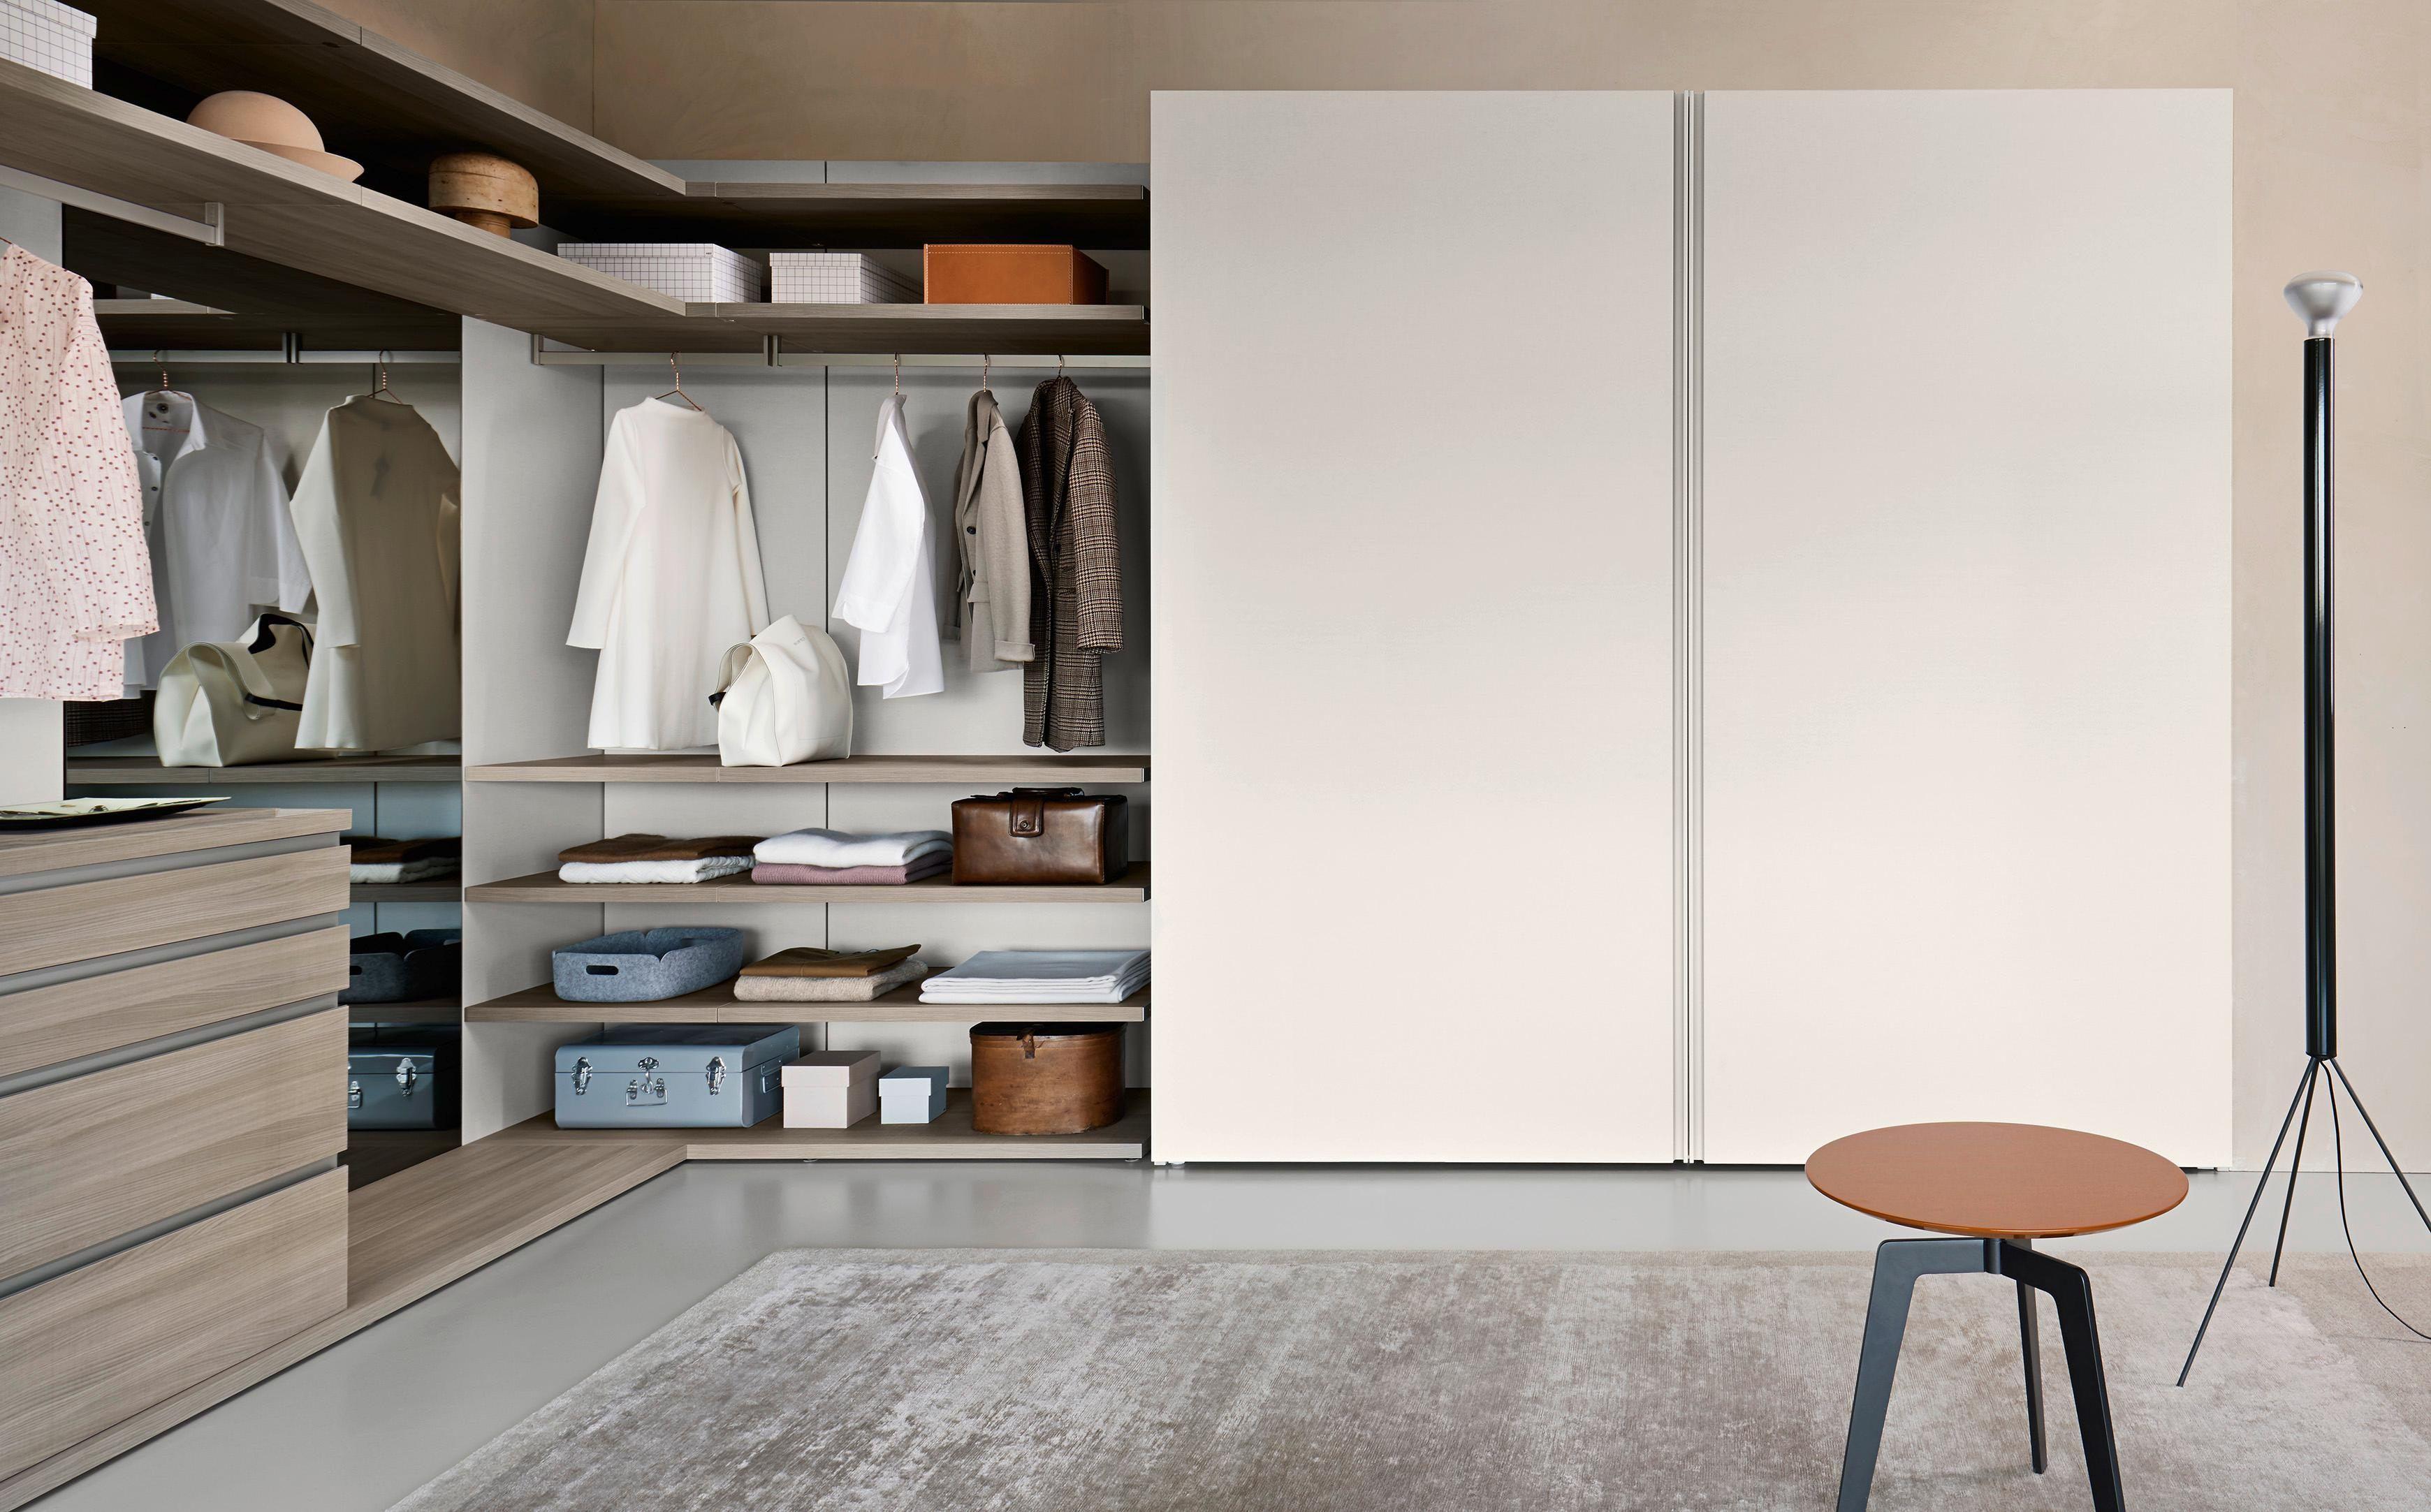 Begehbarer Kleiderschrank Ideen So Geht S Closet Design Walk In